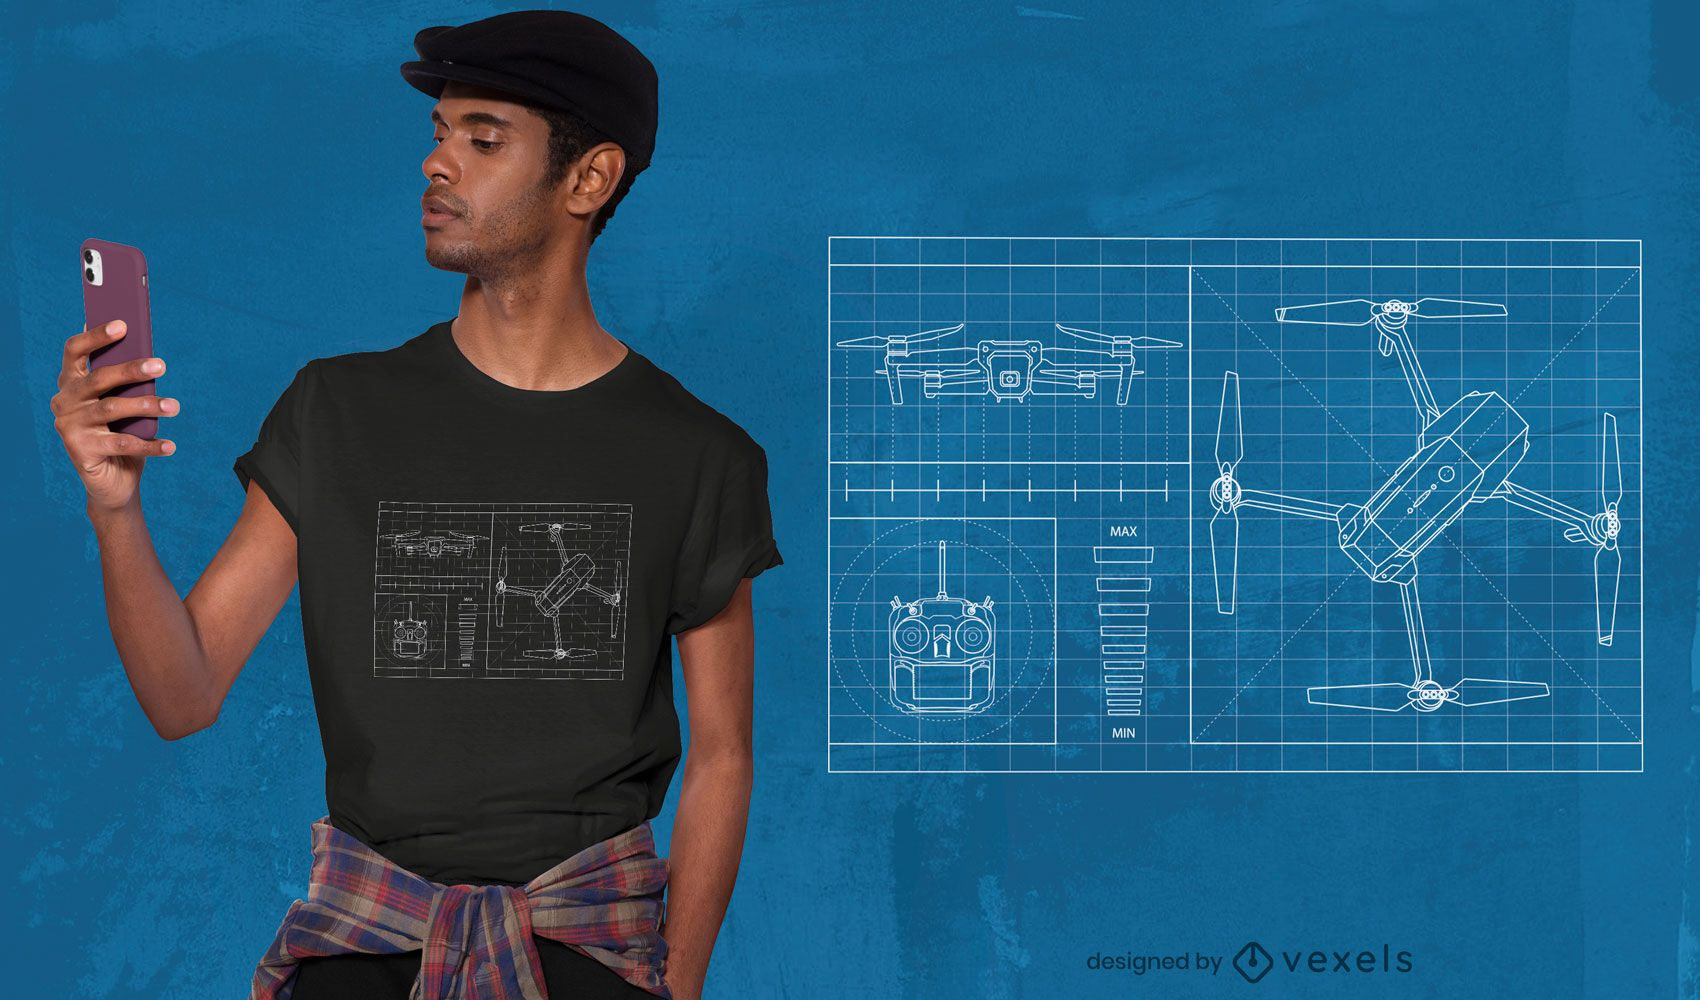 Drone blueprint t-shirt design